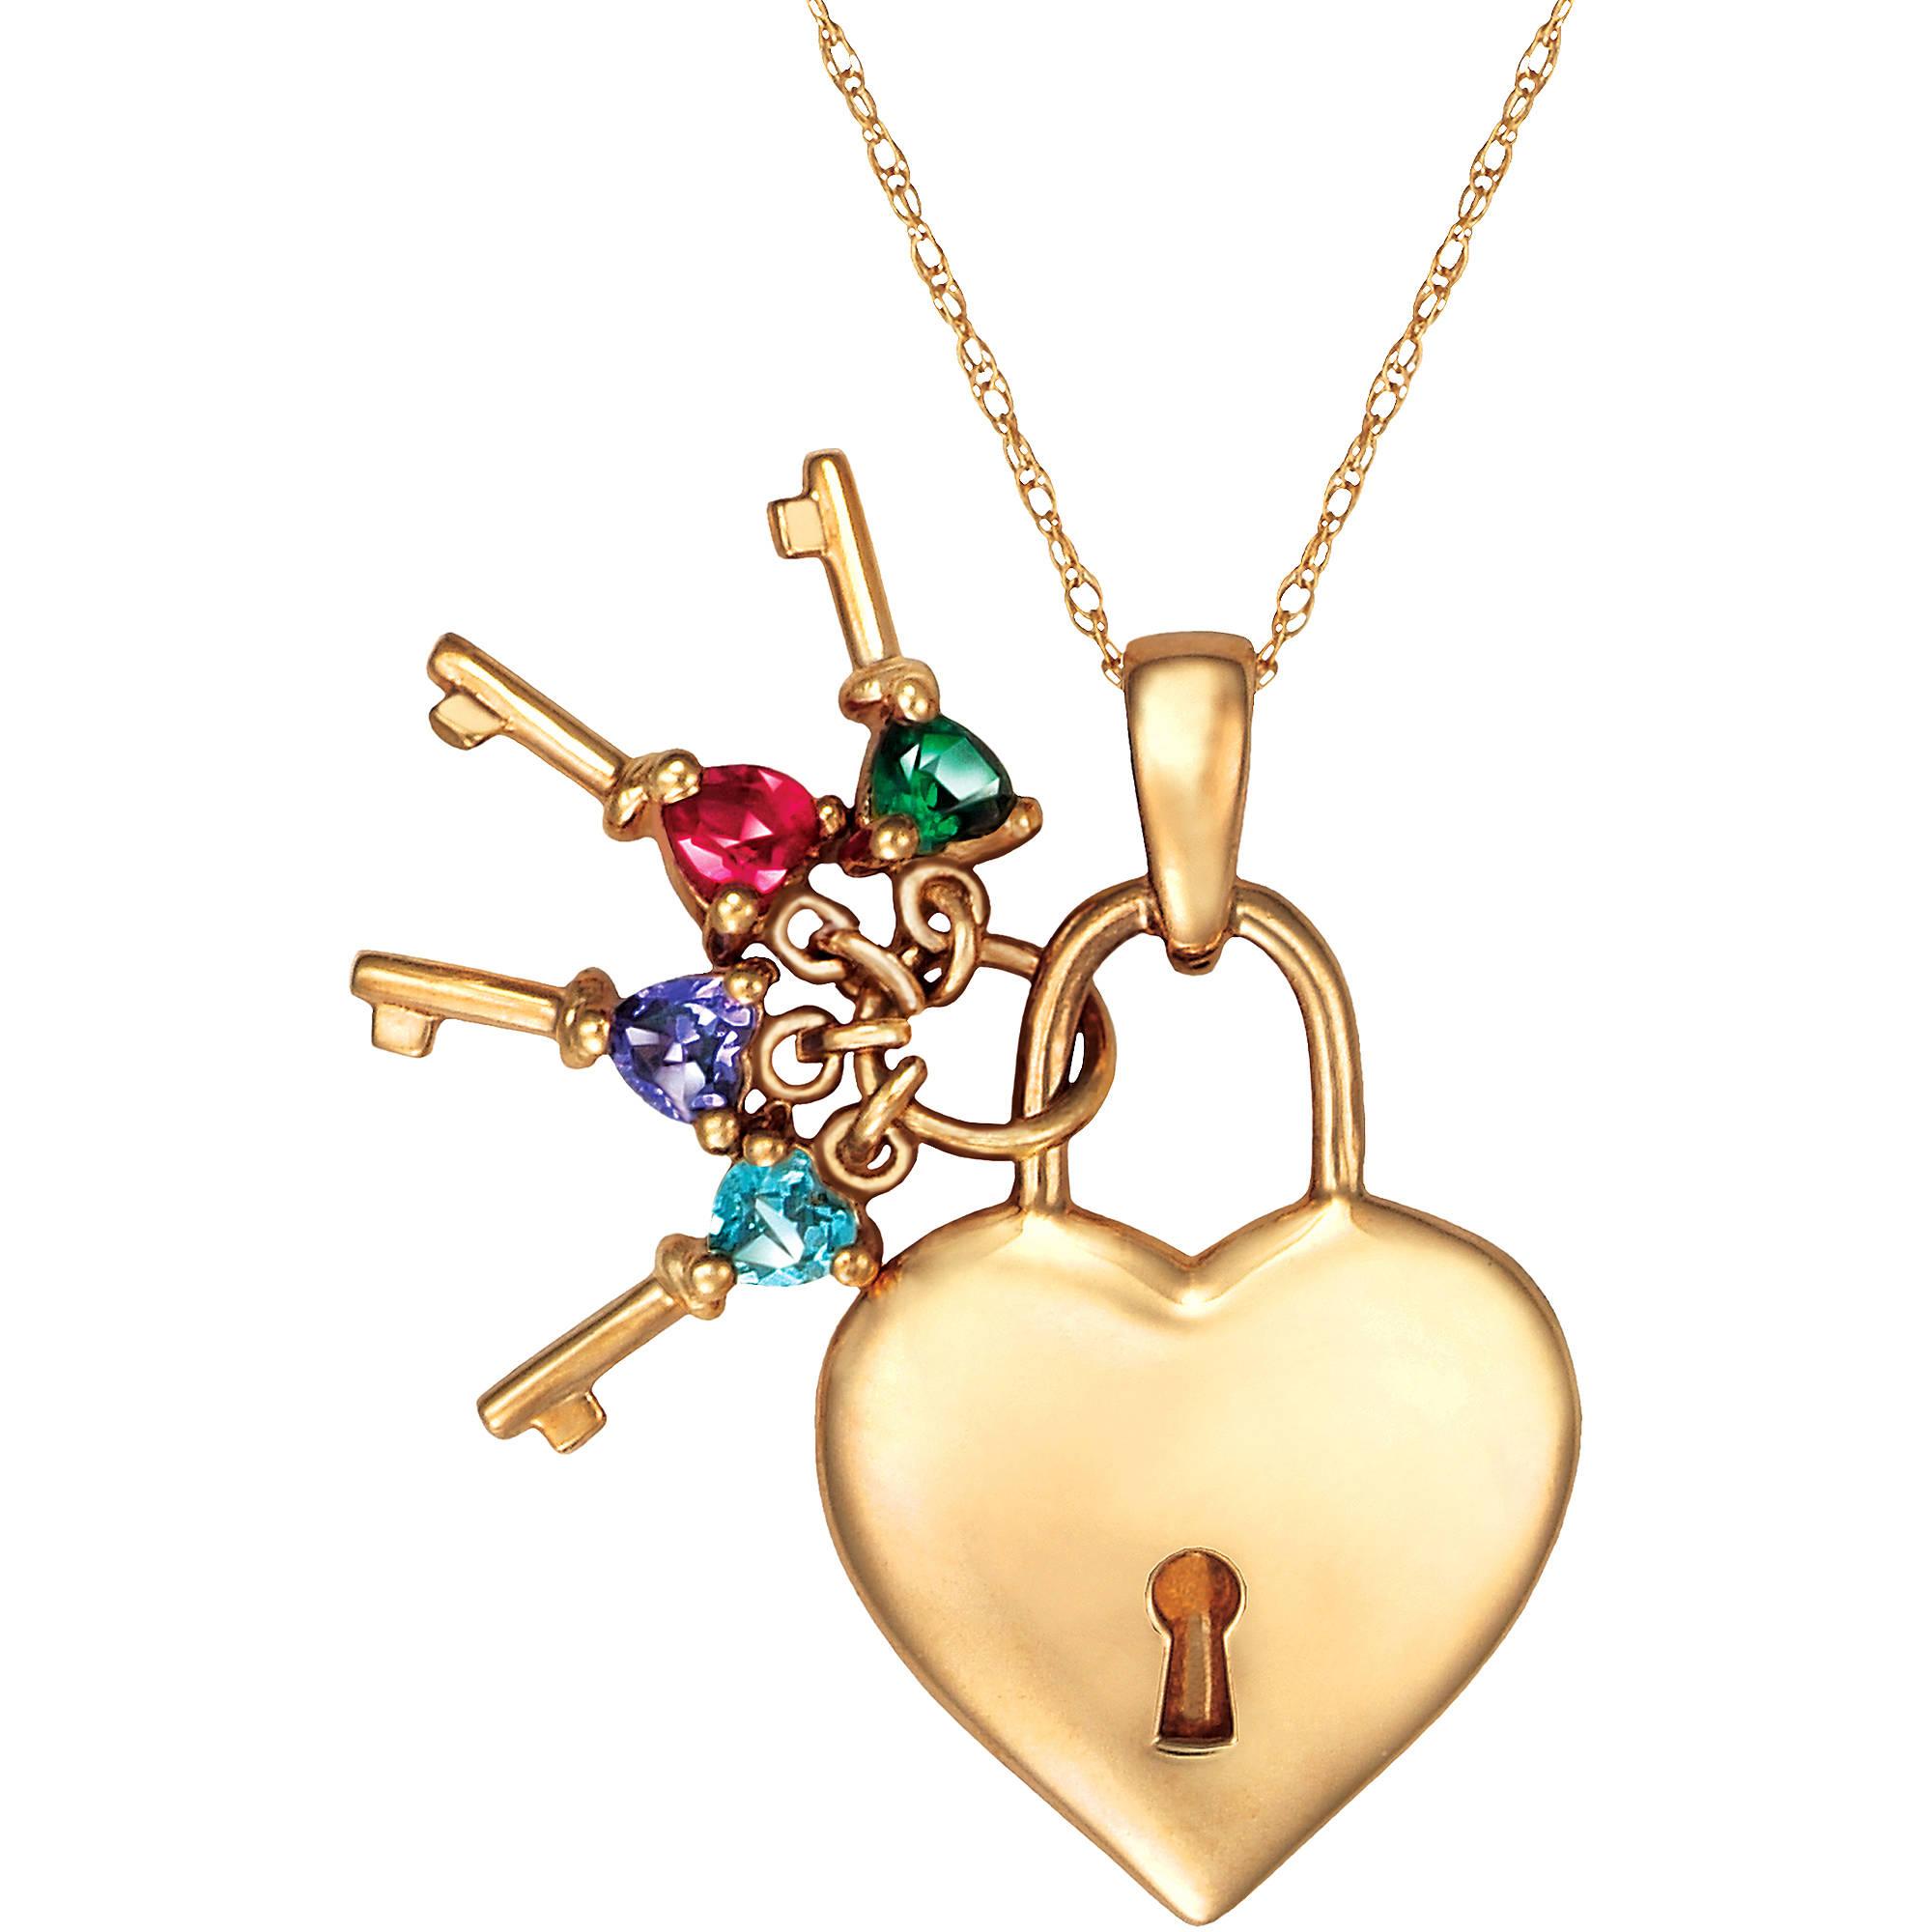 Keepsake Personalized Keys to Her Heart Birthstone Pendant